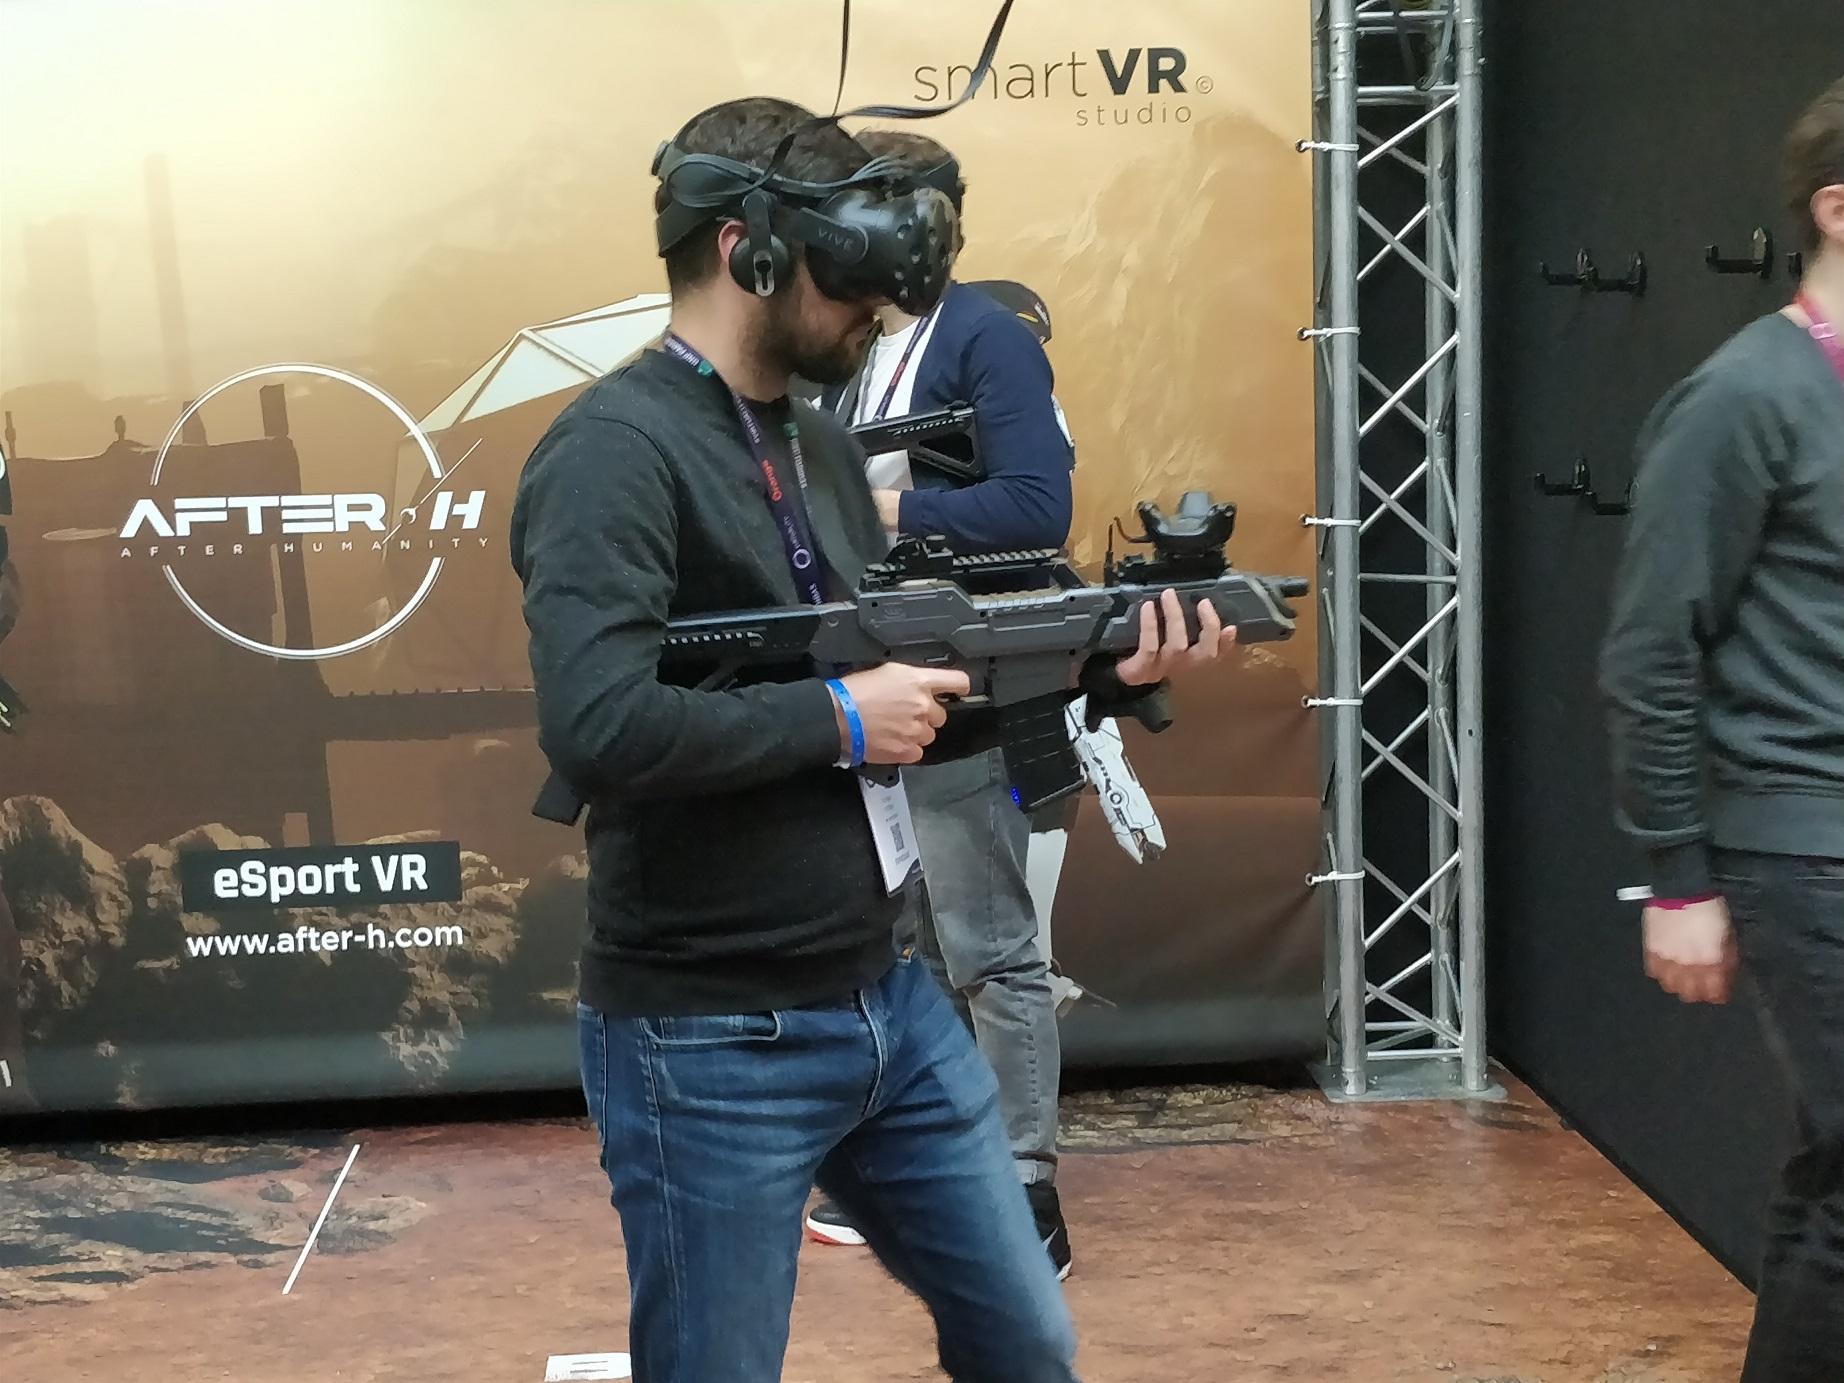 Virtuality 2018 : des technologies toujours plus immersives